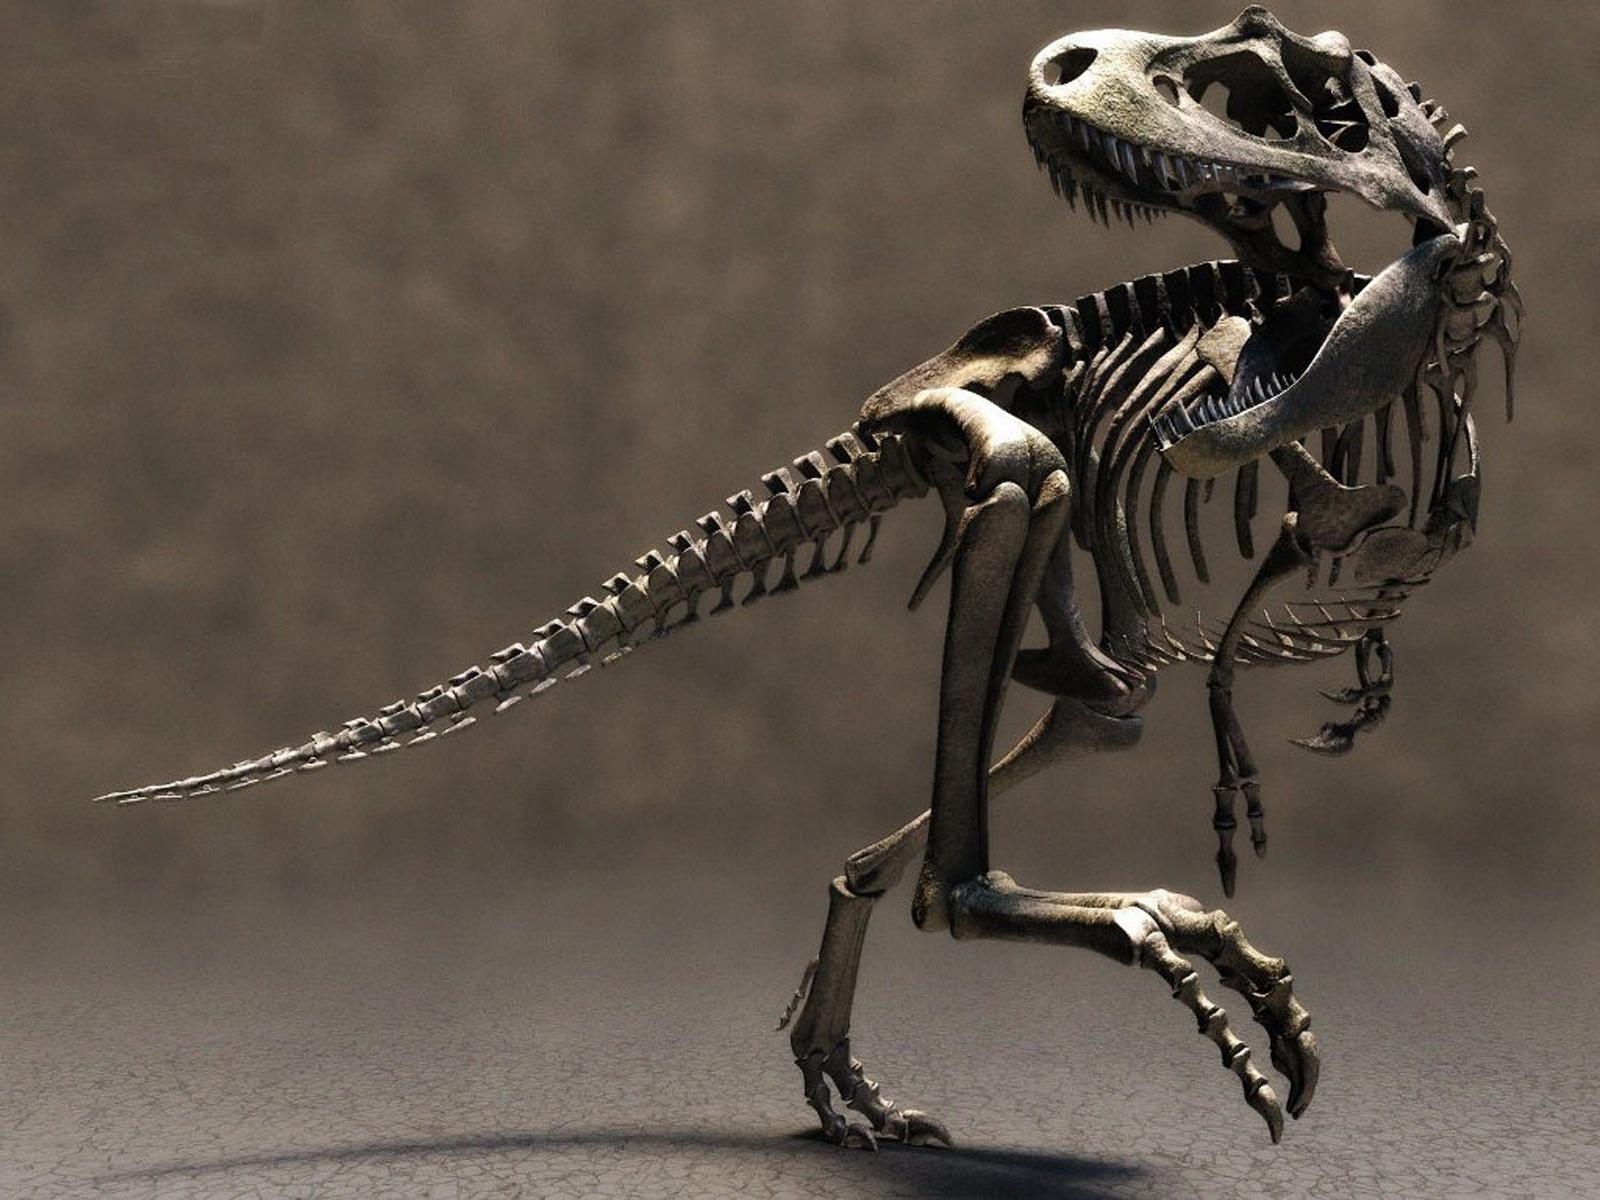 http://2.bp.blogspot.com/_EAViqbzwc_s/TOOPUxoothI/AAAAAAAACRc/_CjTtRyEu54/s1600/dinosaur.jpg